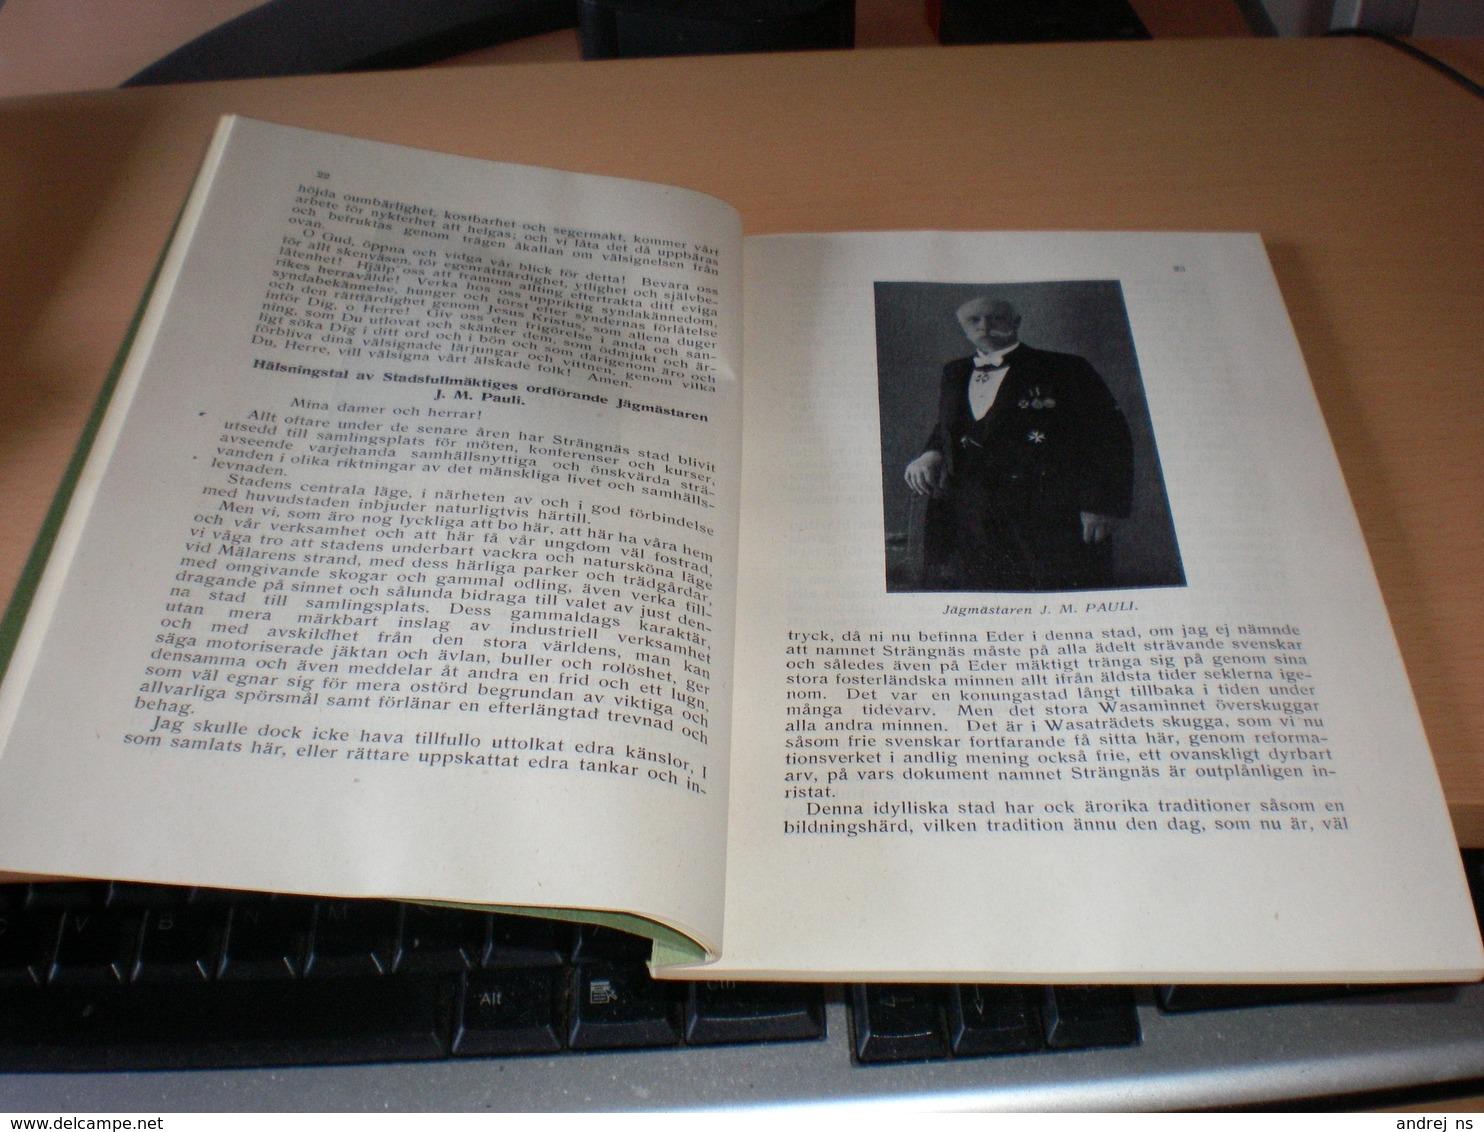 Centralforbundet For Nykterhetsundervisning 124 De Allmanna Upplysningskurs  1925 Sala 1926 J M Pauli Jagmastern - Books, Magazines, Comics